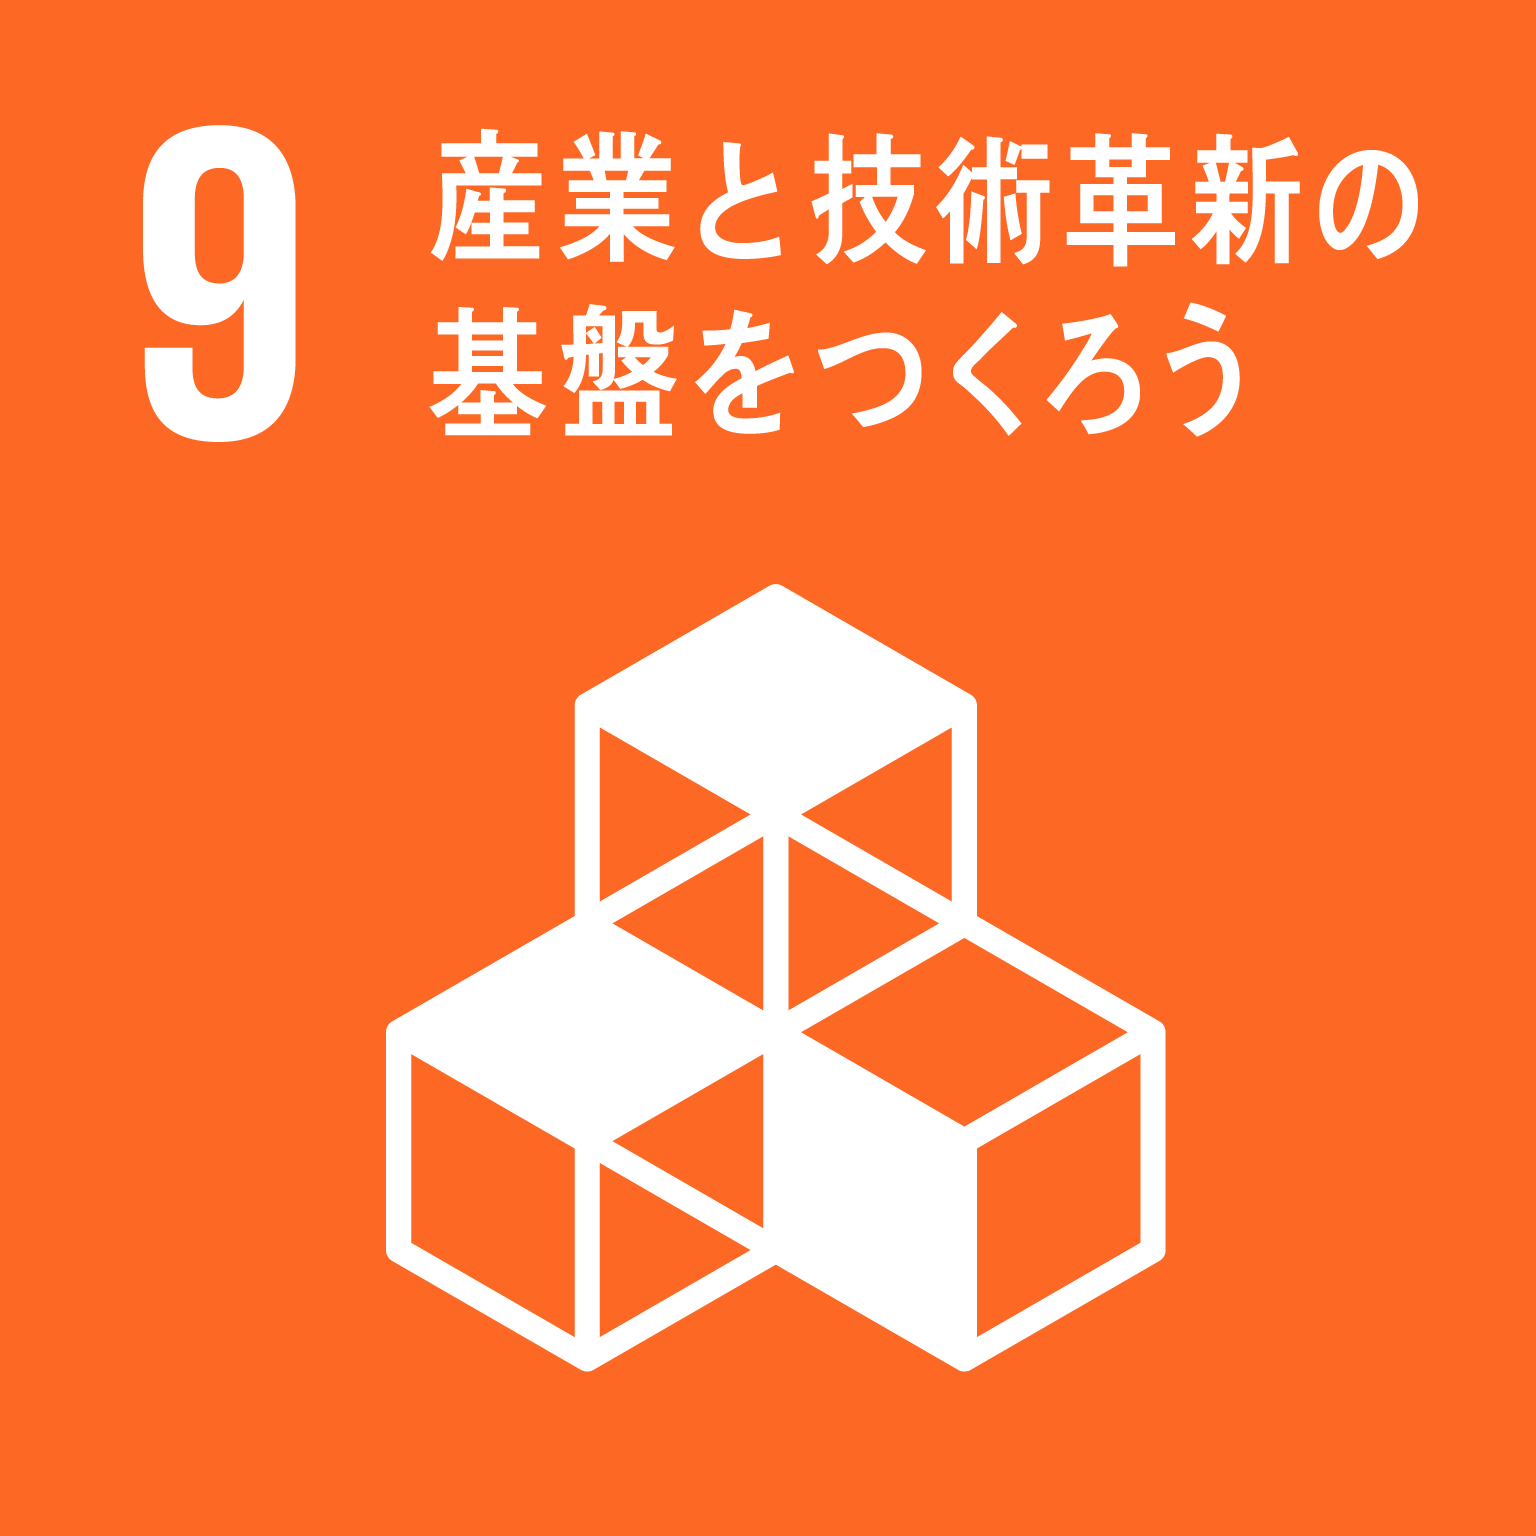 https://www.tut.ac.jp/about/images/sdg_icon_09_ja.png